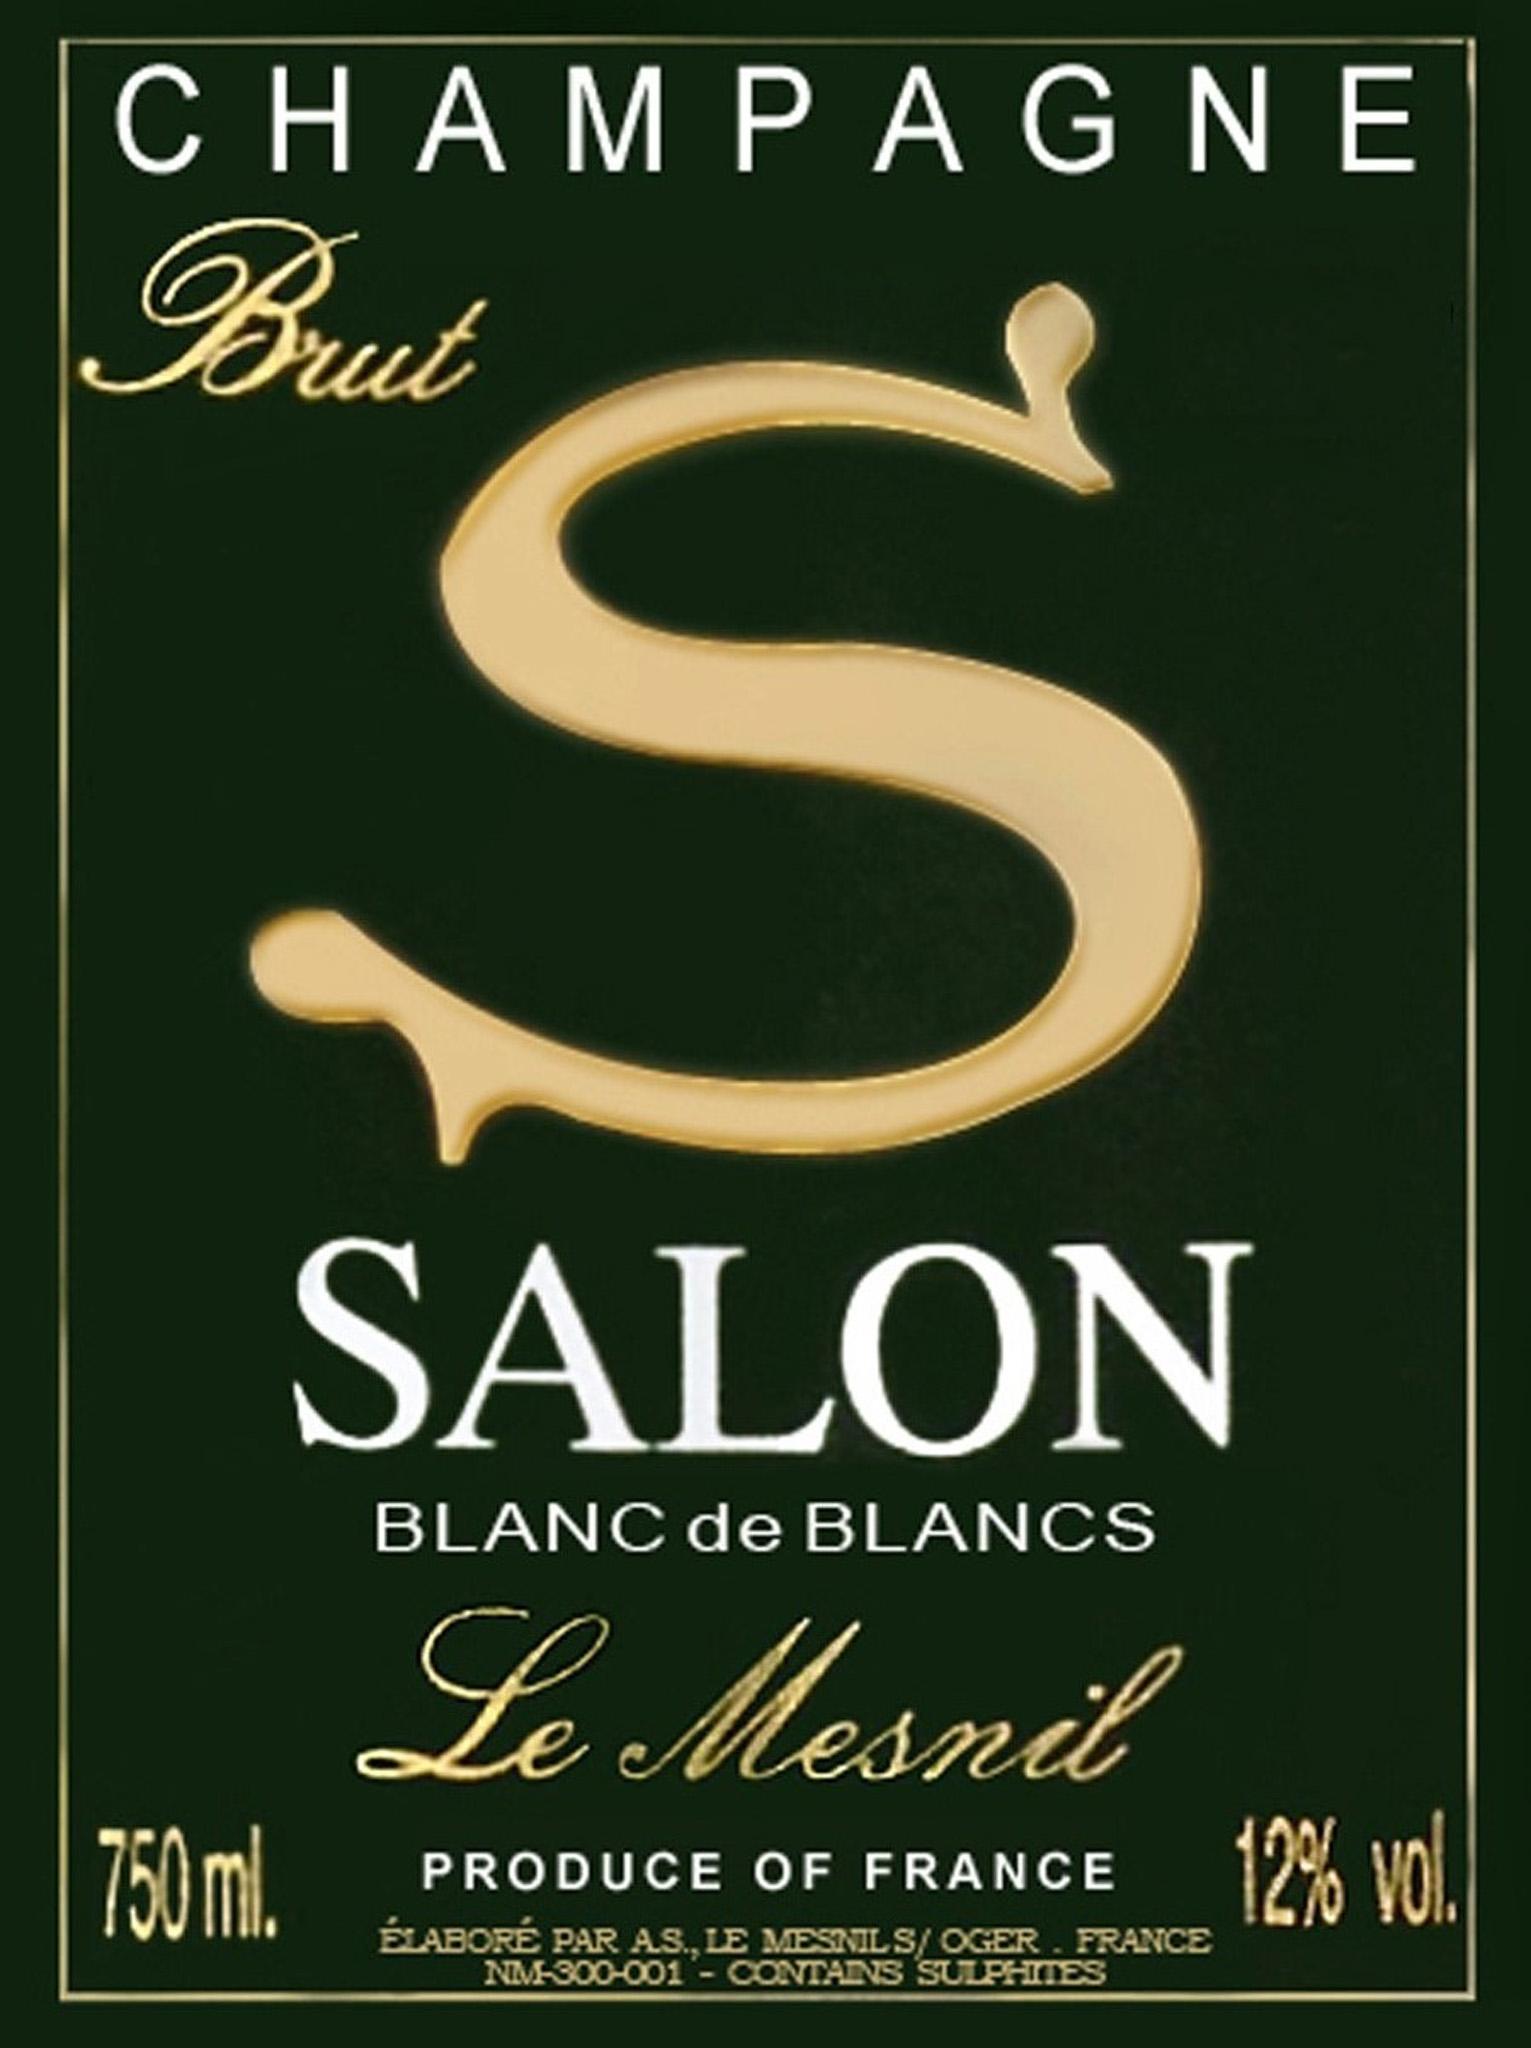 Salon Le Mesnil Blanc de Blancs 1997